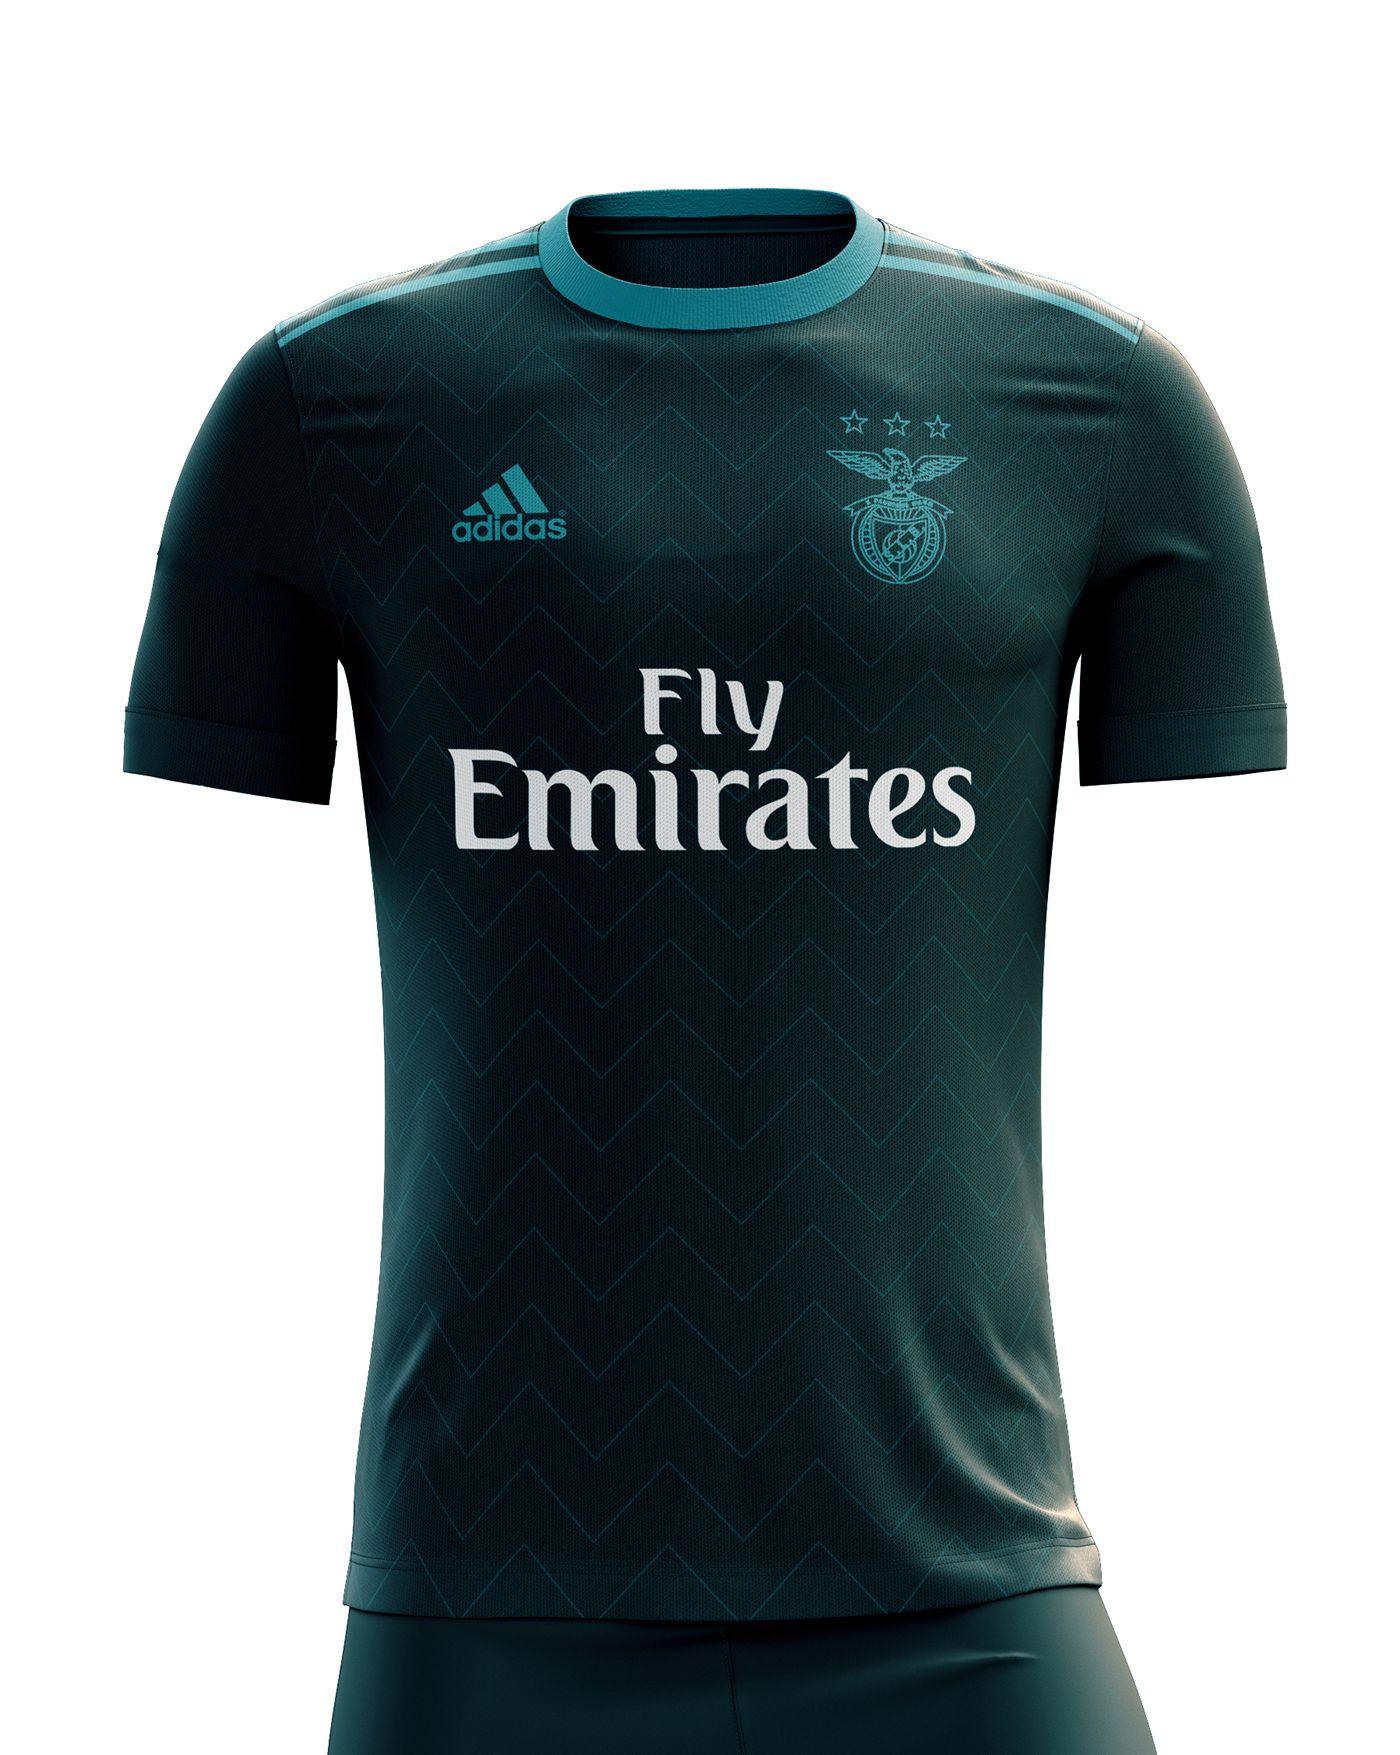 sneakers for cheap 1c6c9 30cba SL Benfica Football Kit 17/18. on Behance | Kits | Football ...